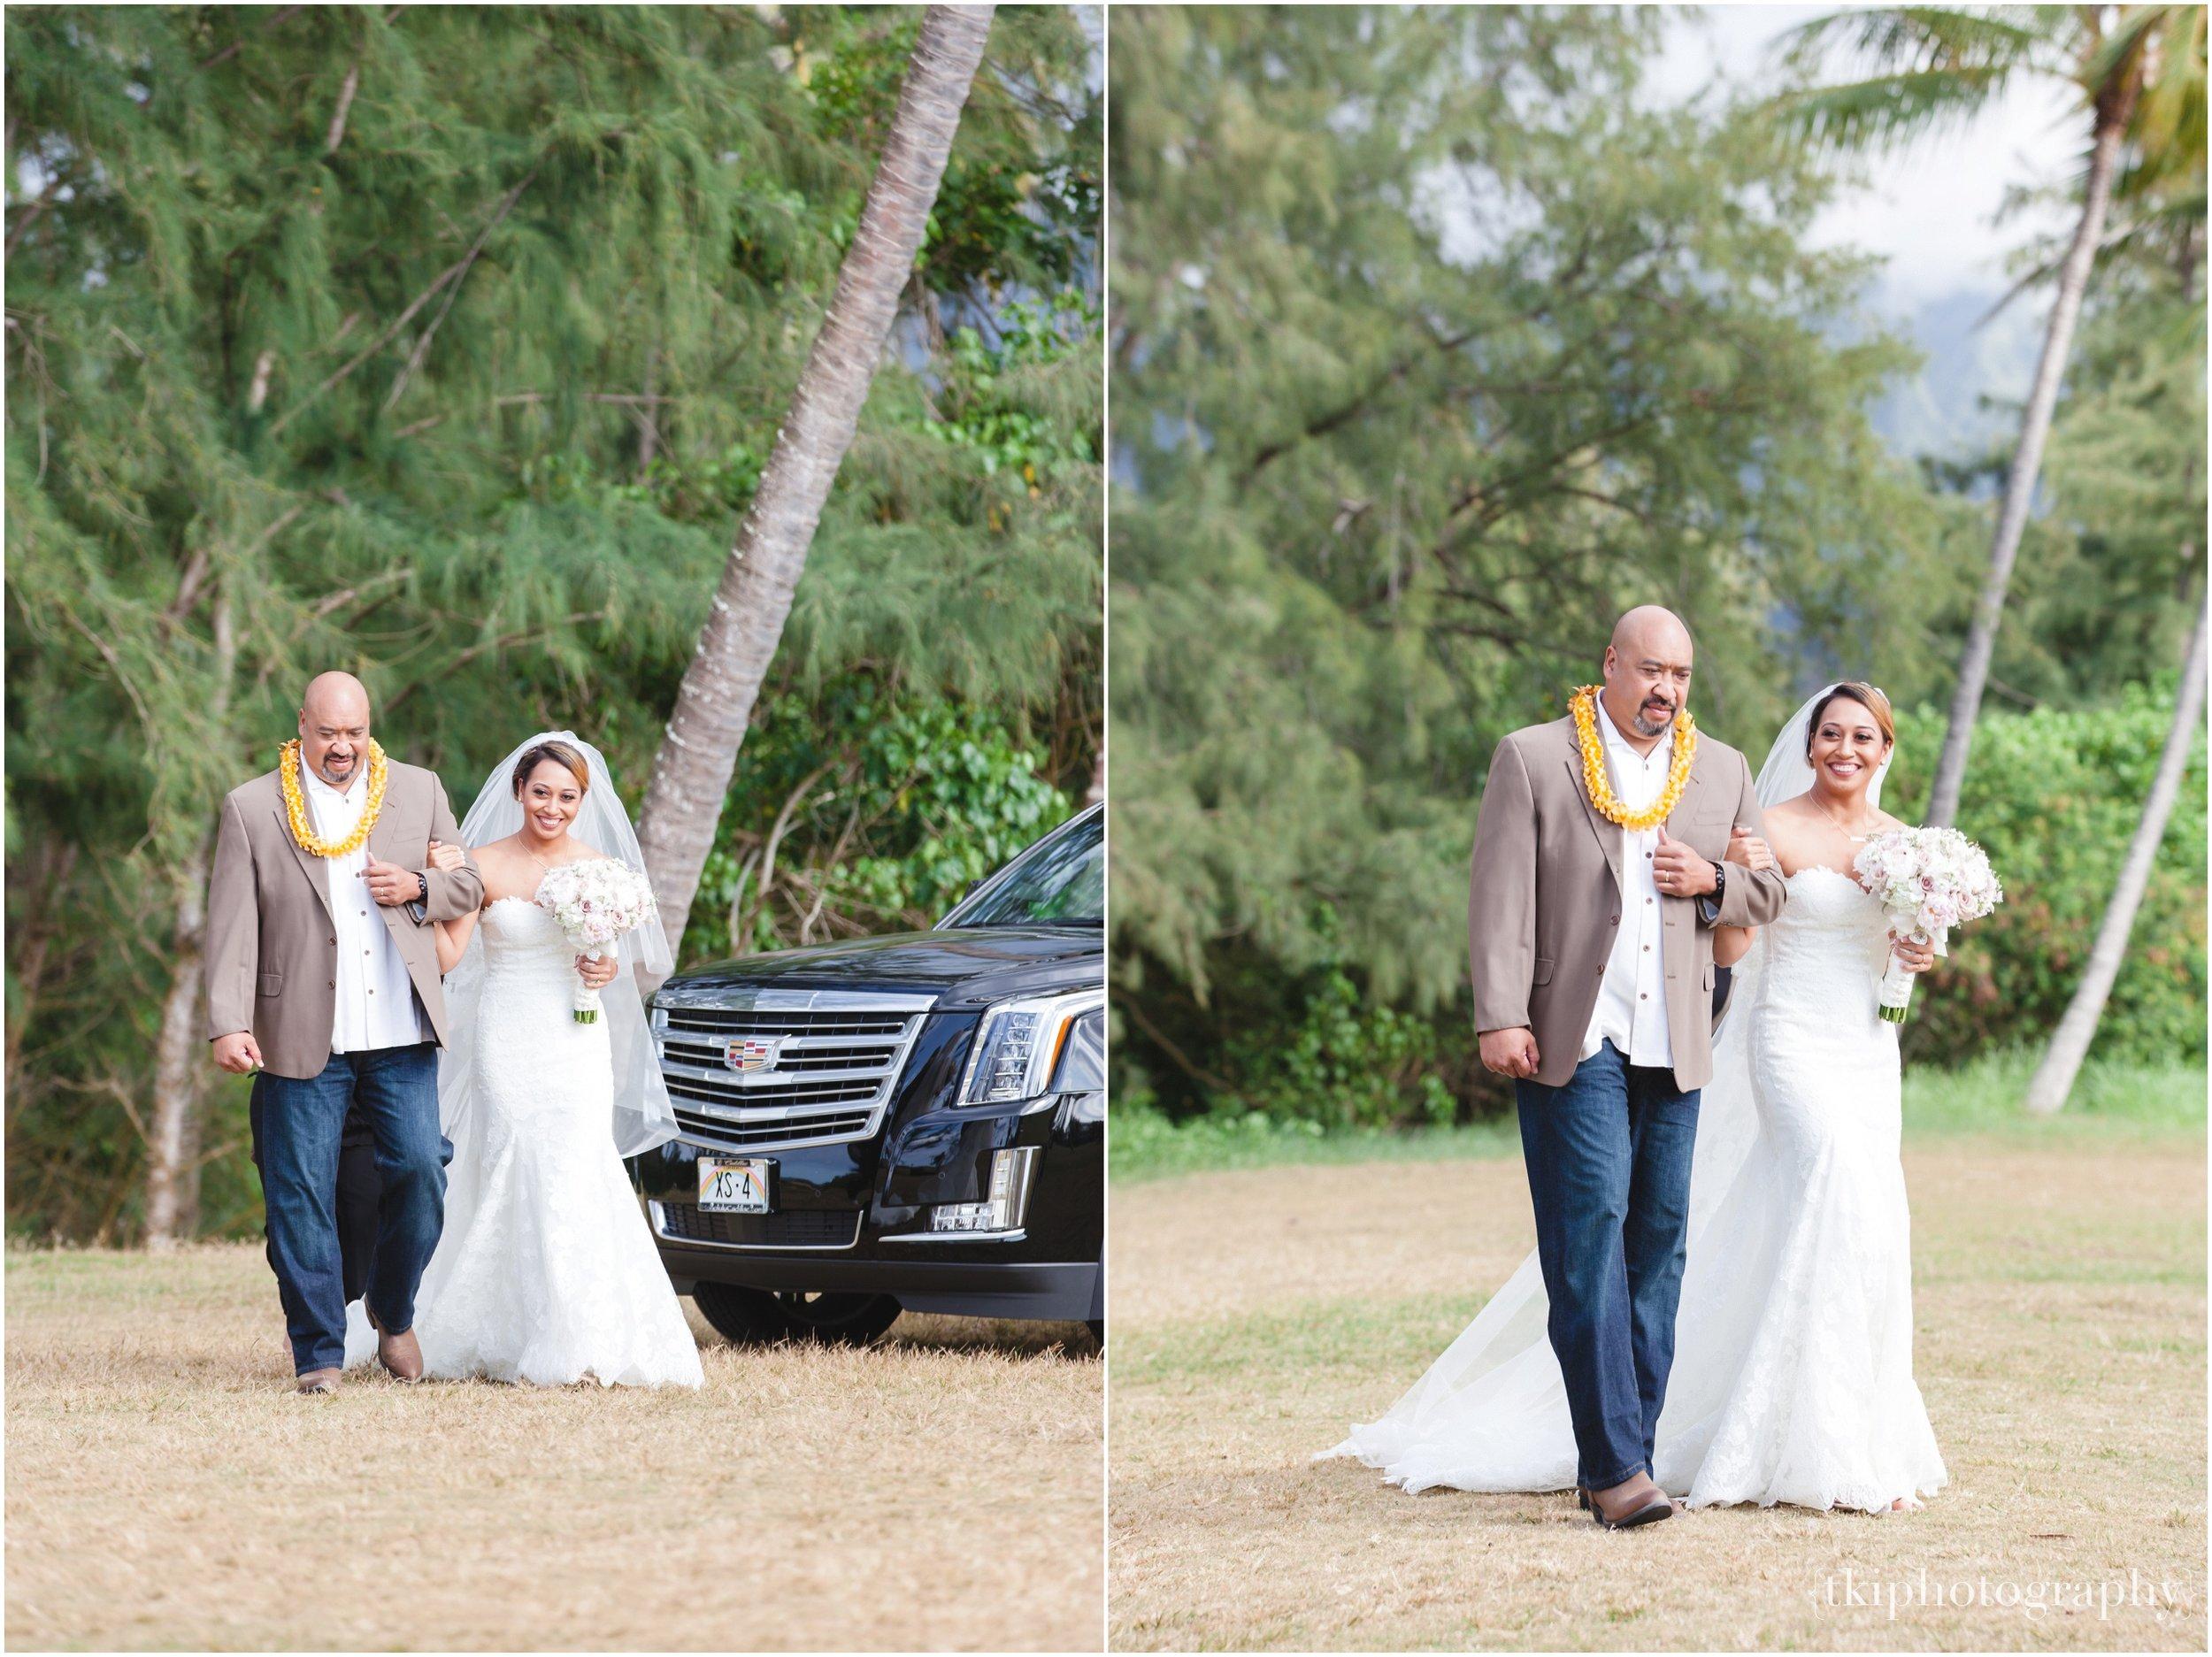 Oahu-Destination-Wedding-Beach_0084.jpg